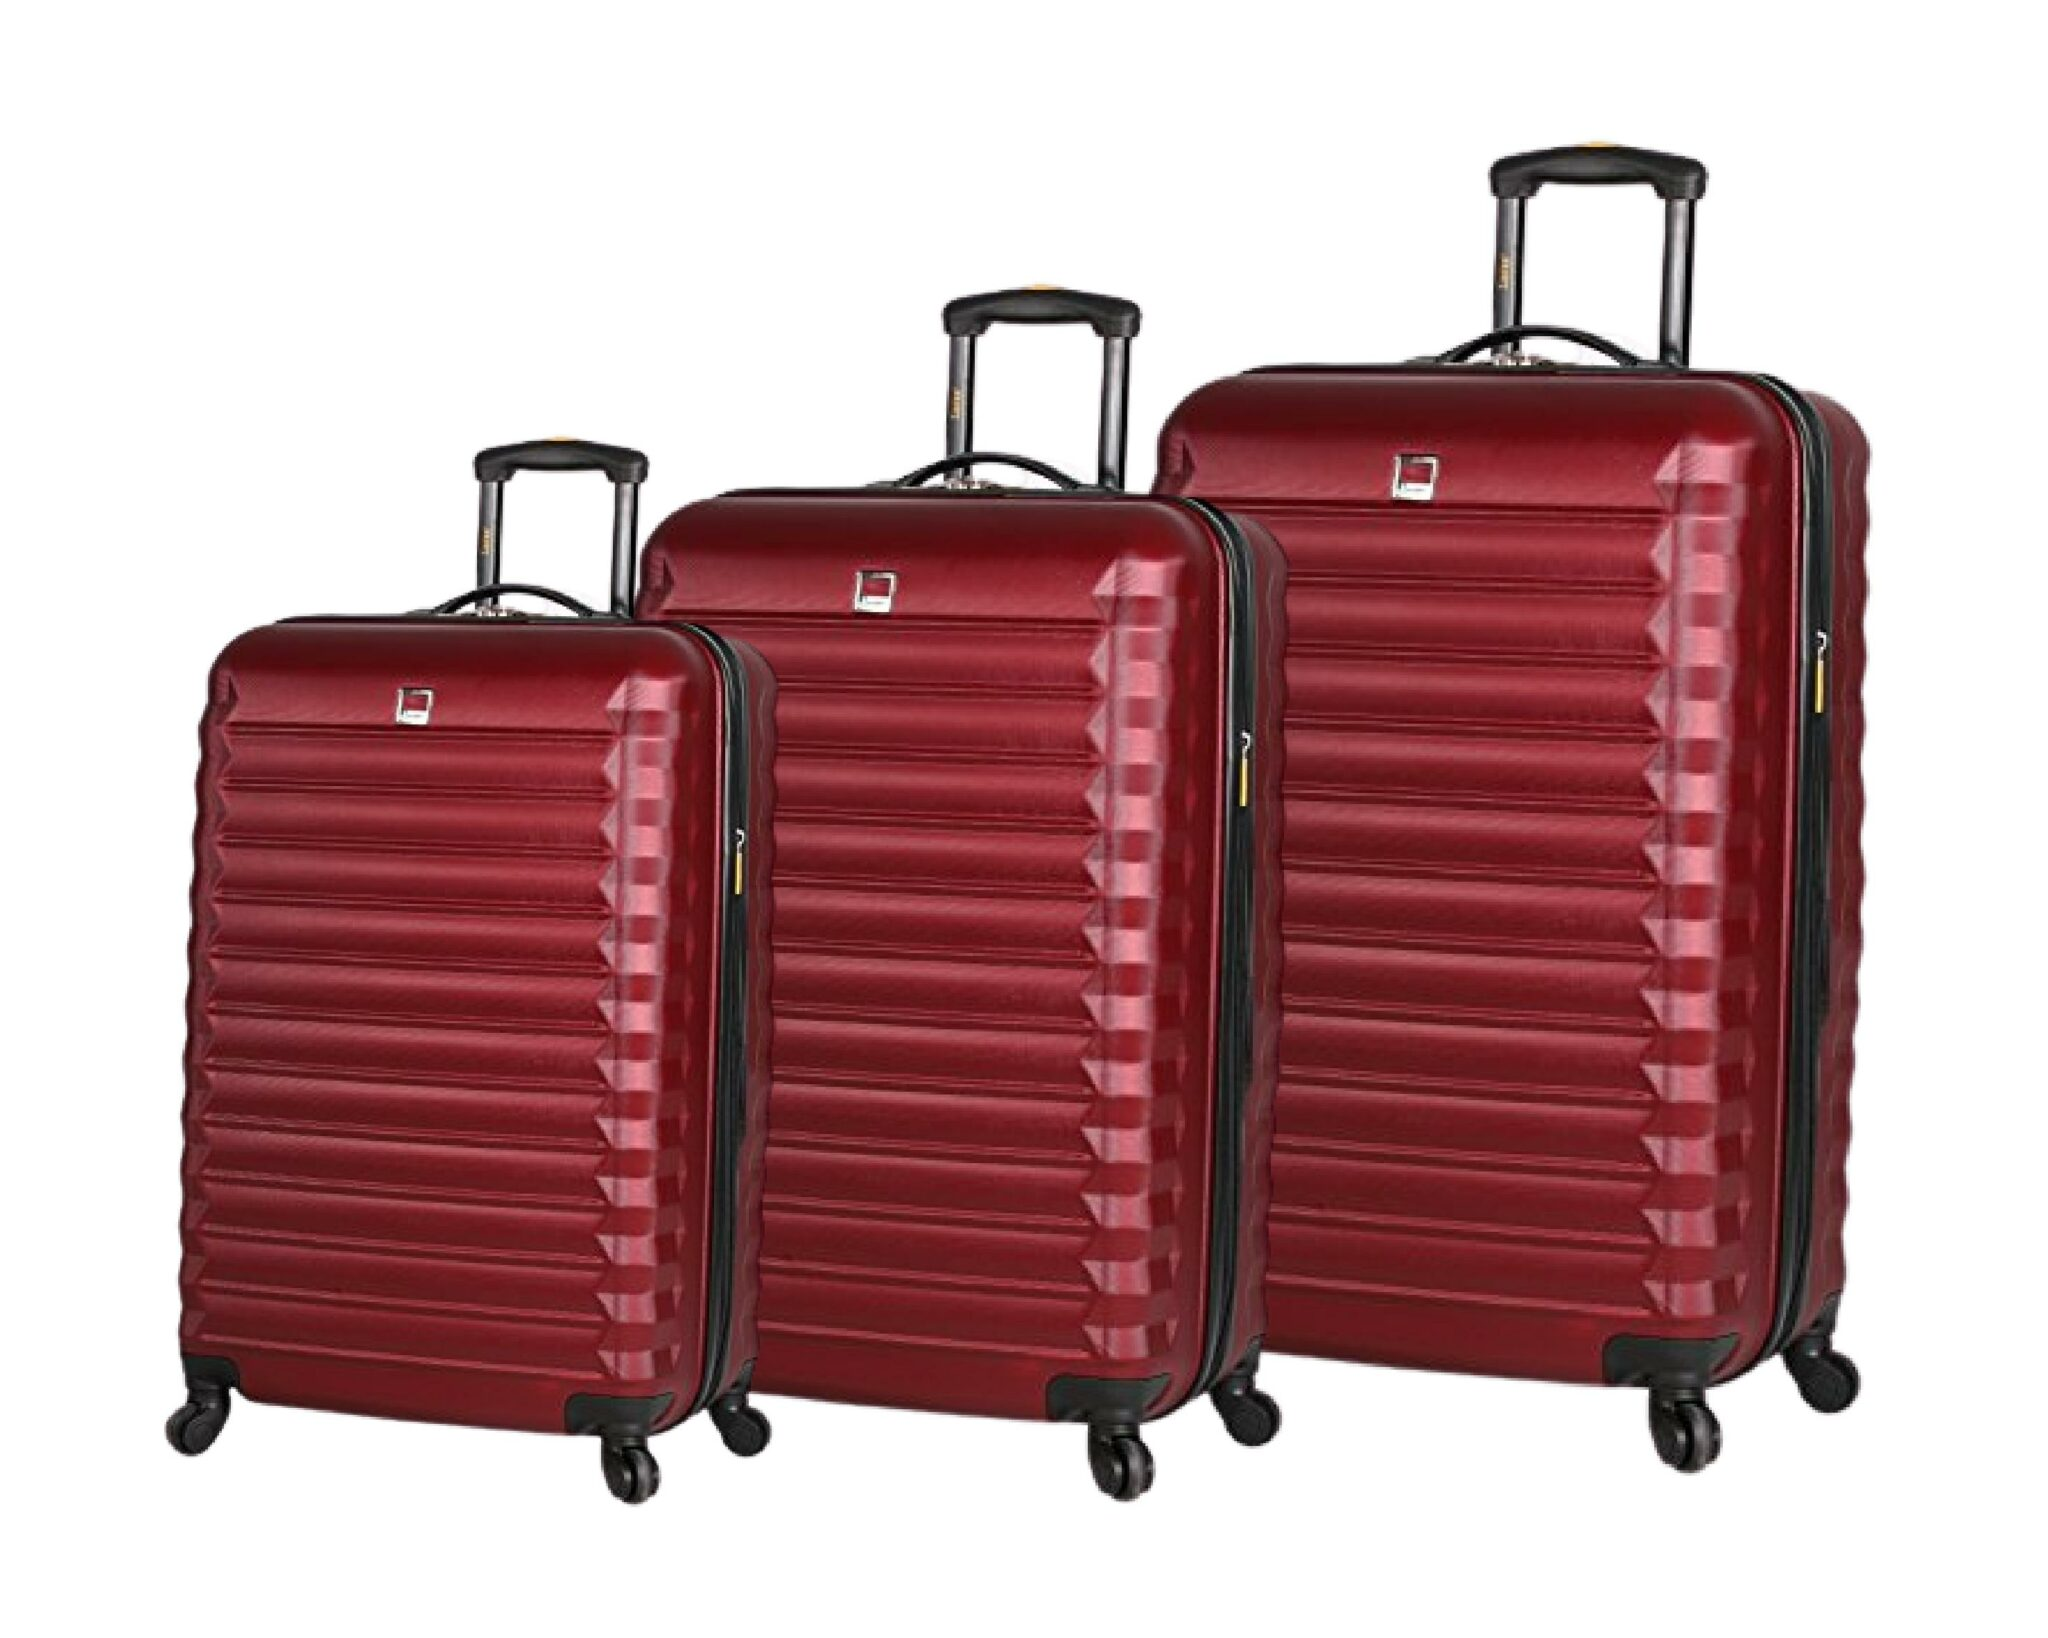 Lucas Luggage Review: Lucas Treadlight 3 piece